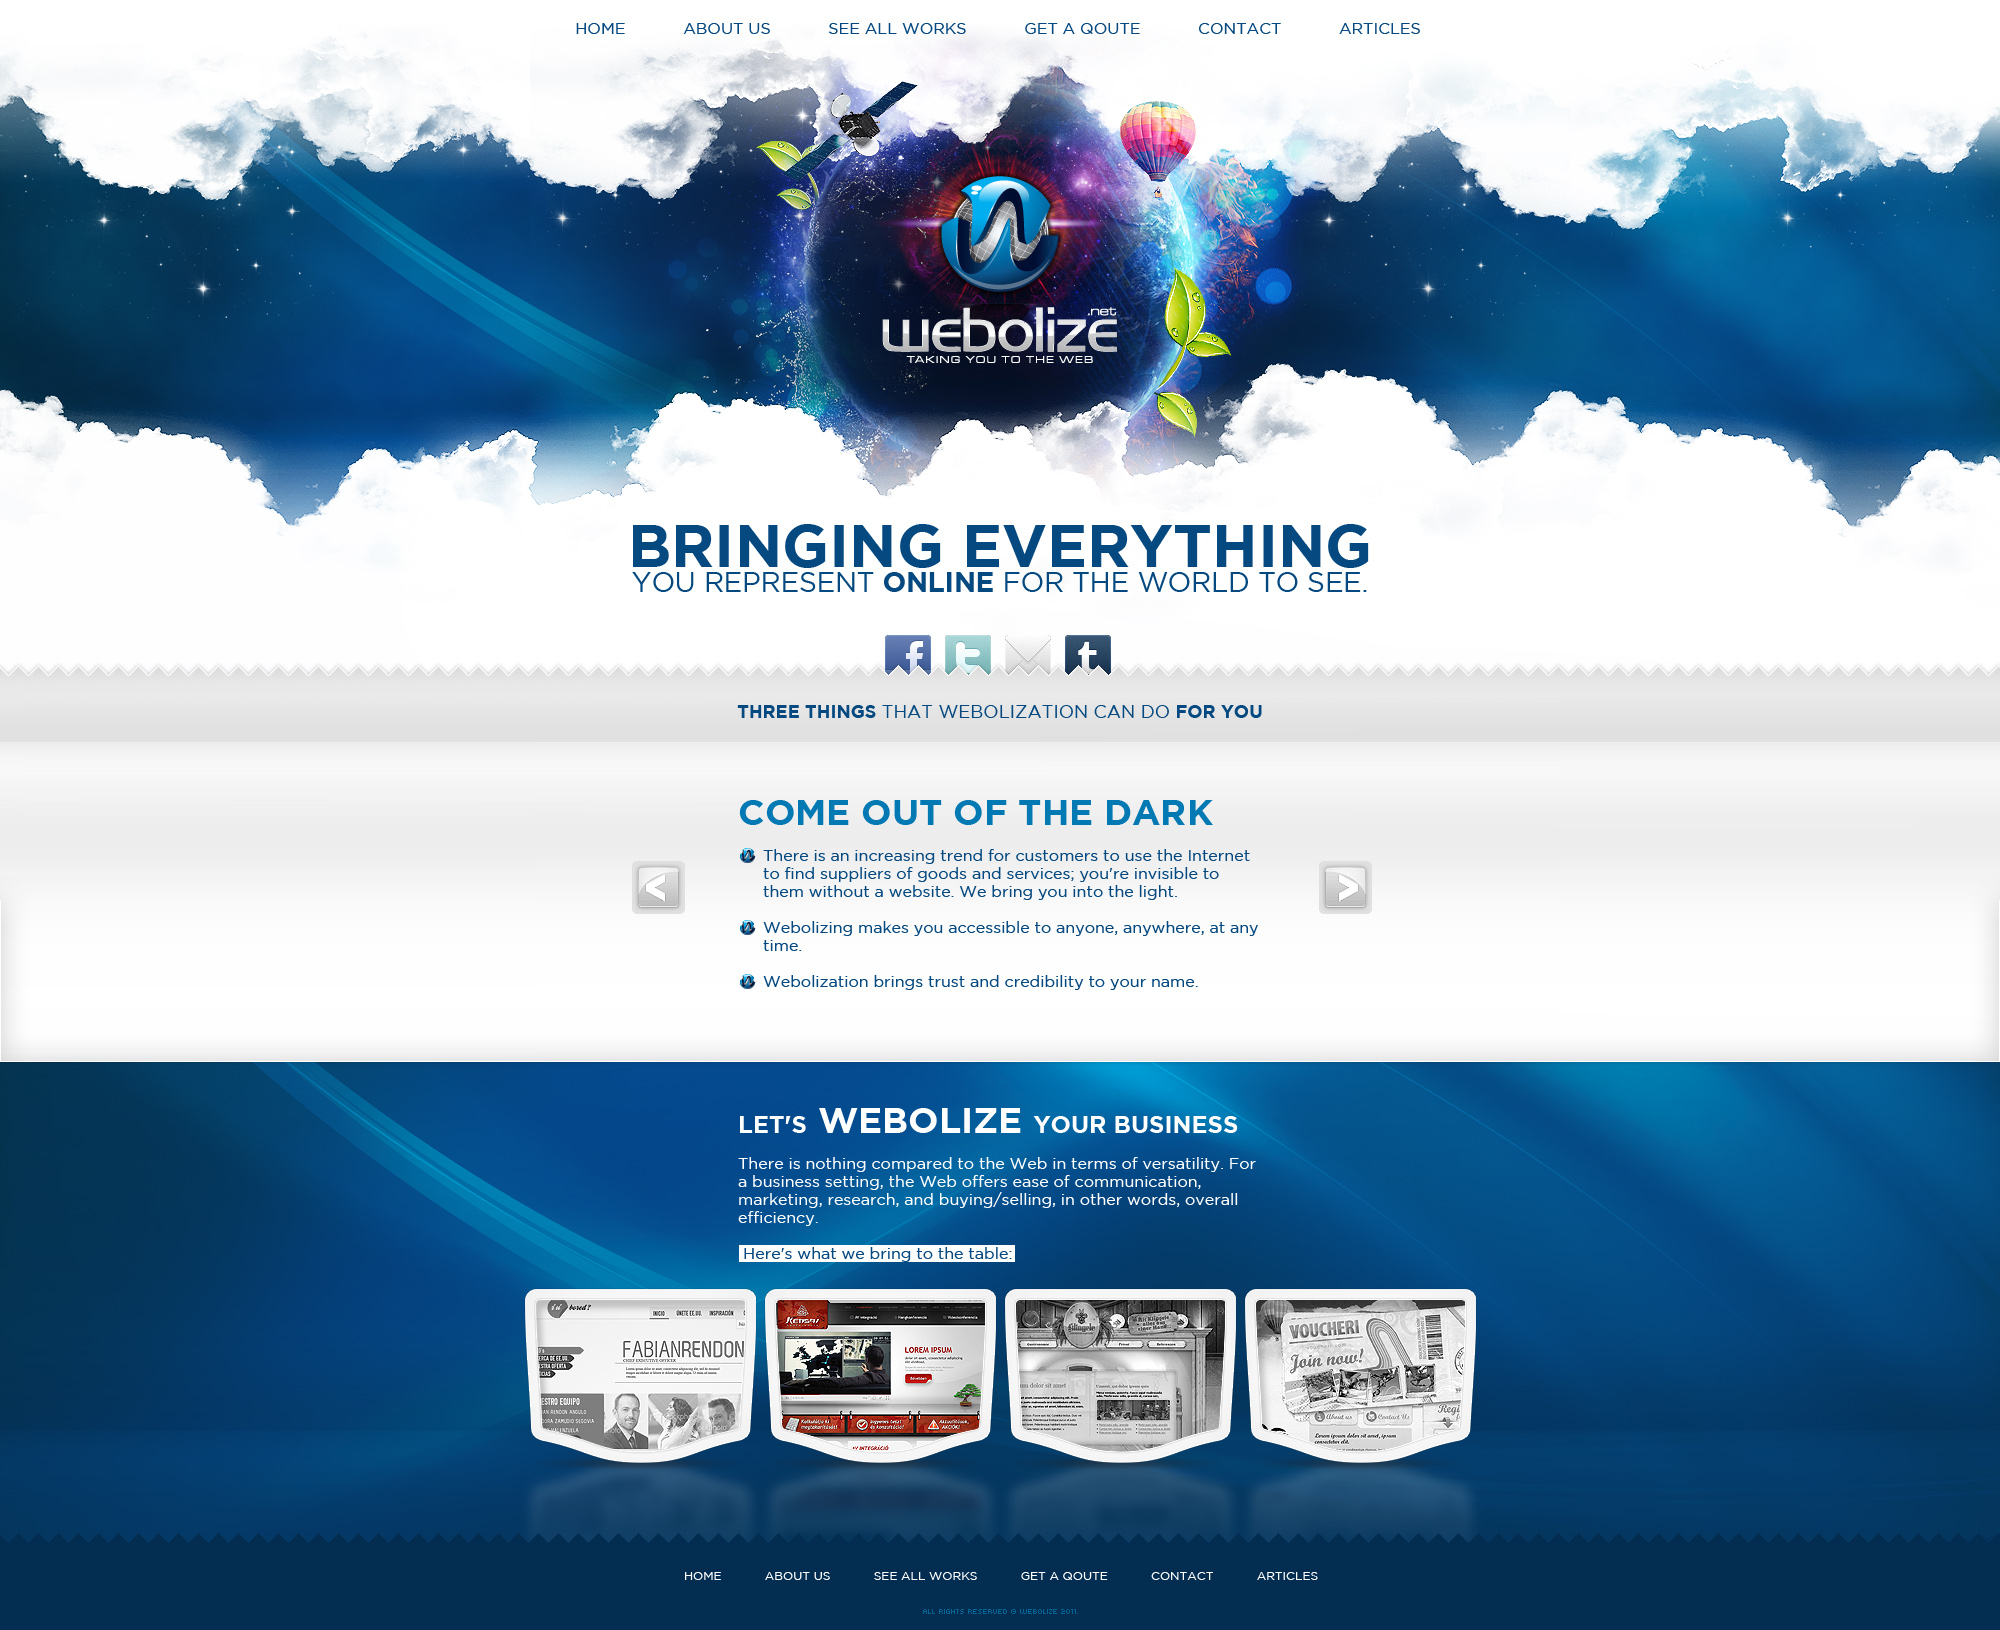 Web Design: Webolize